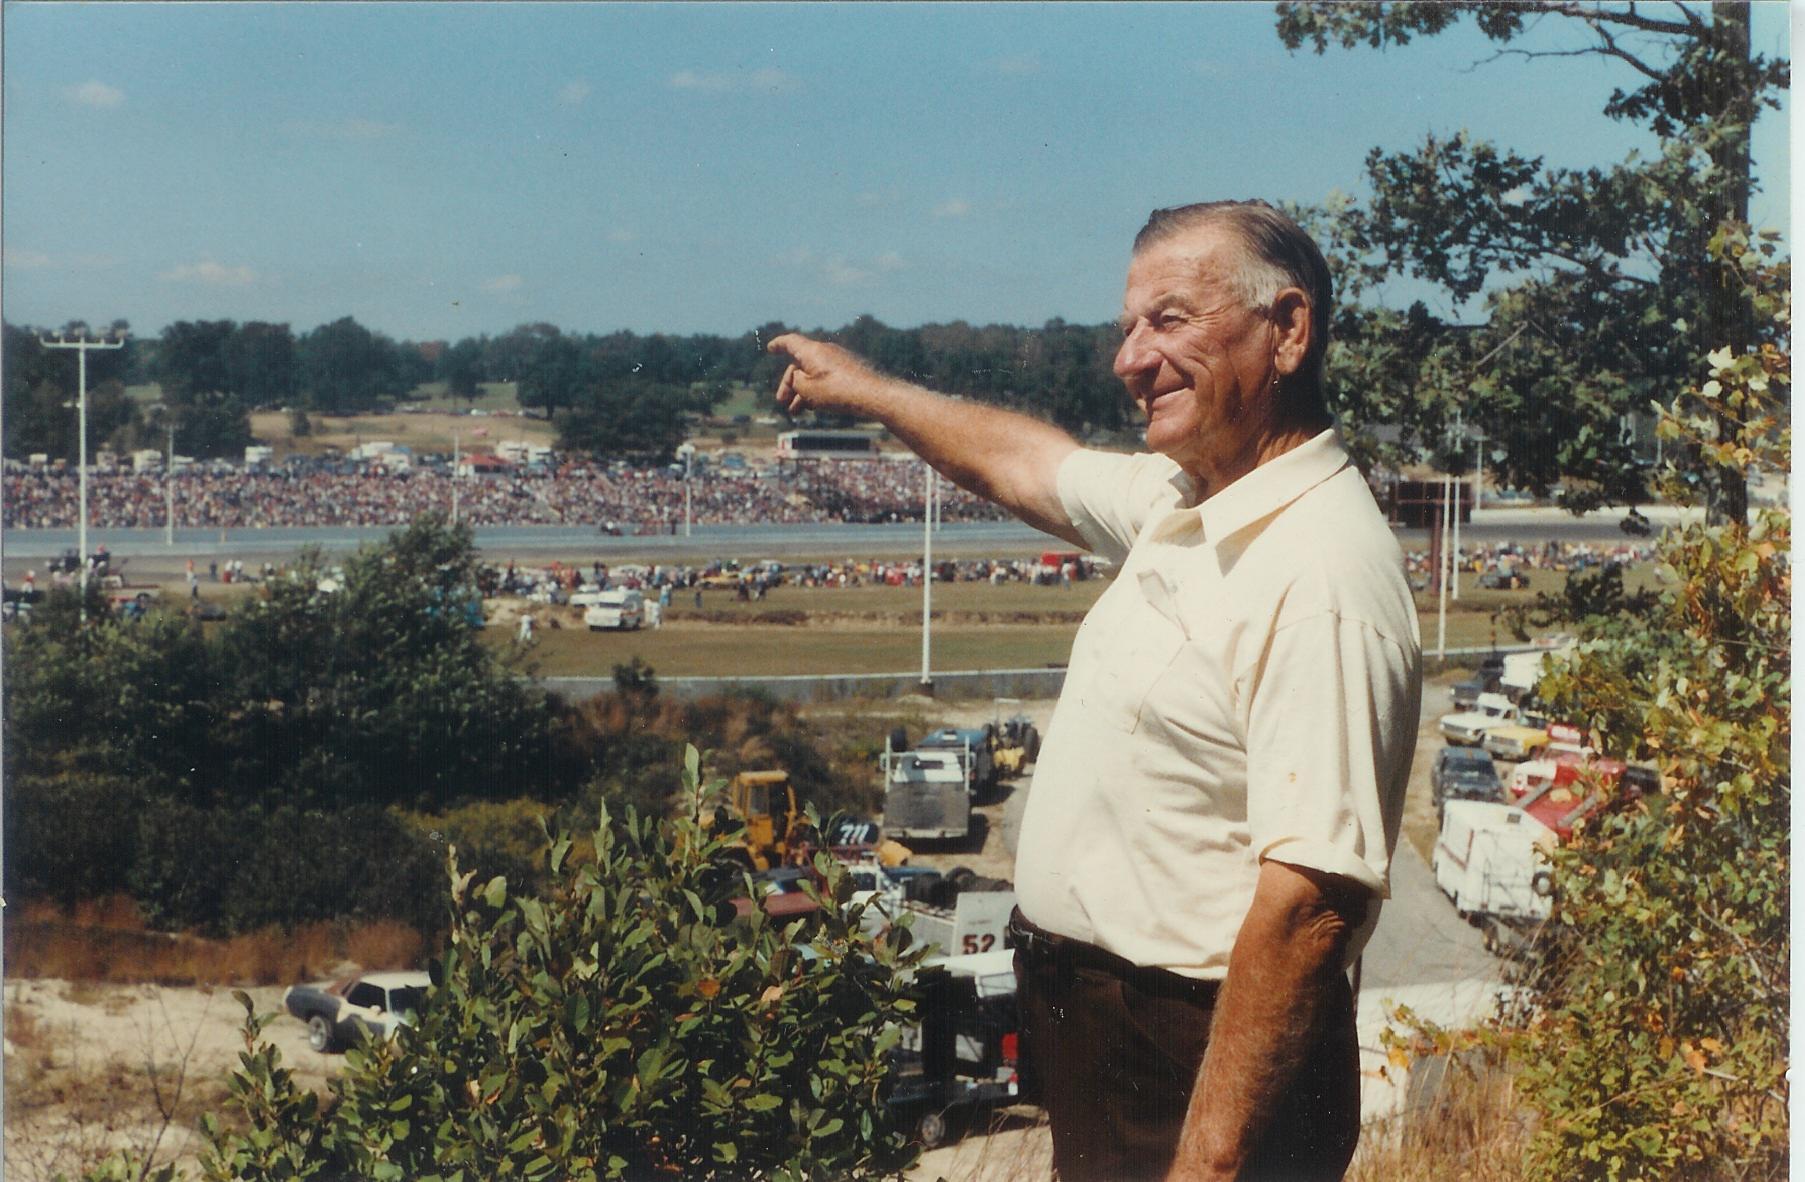 john hoenig and Thompson Speedway